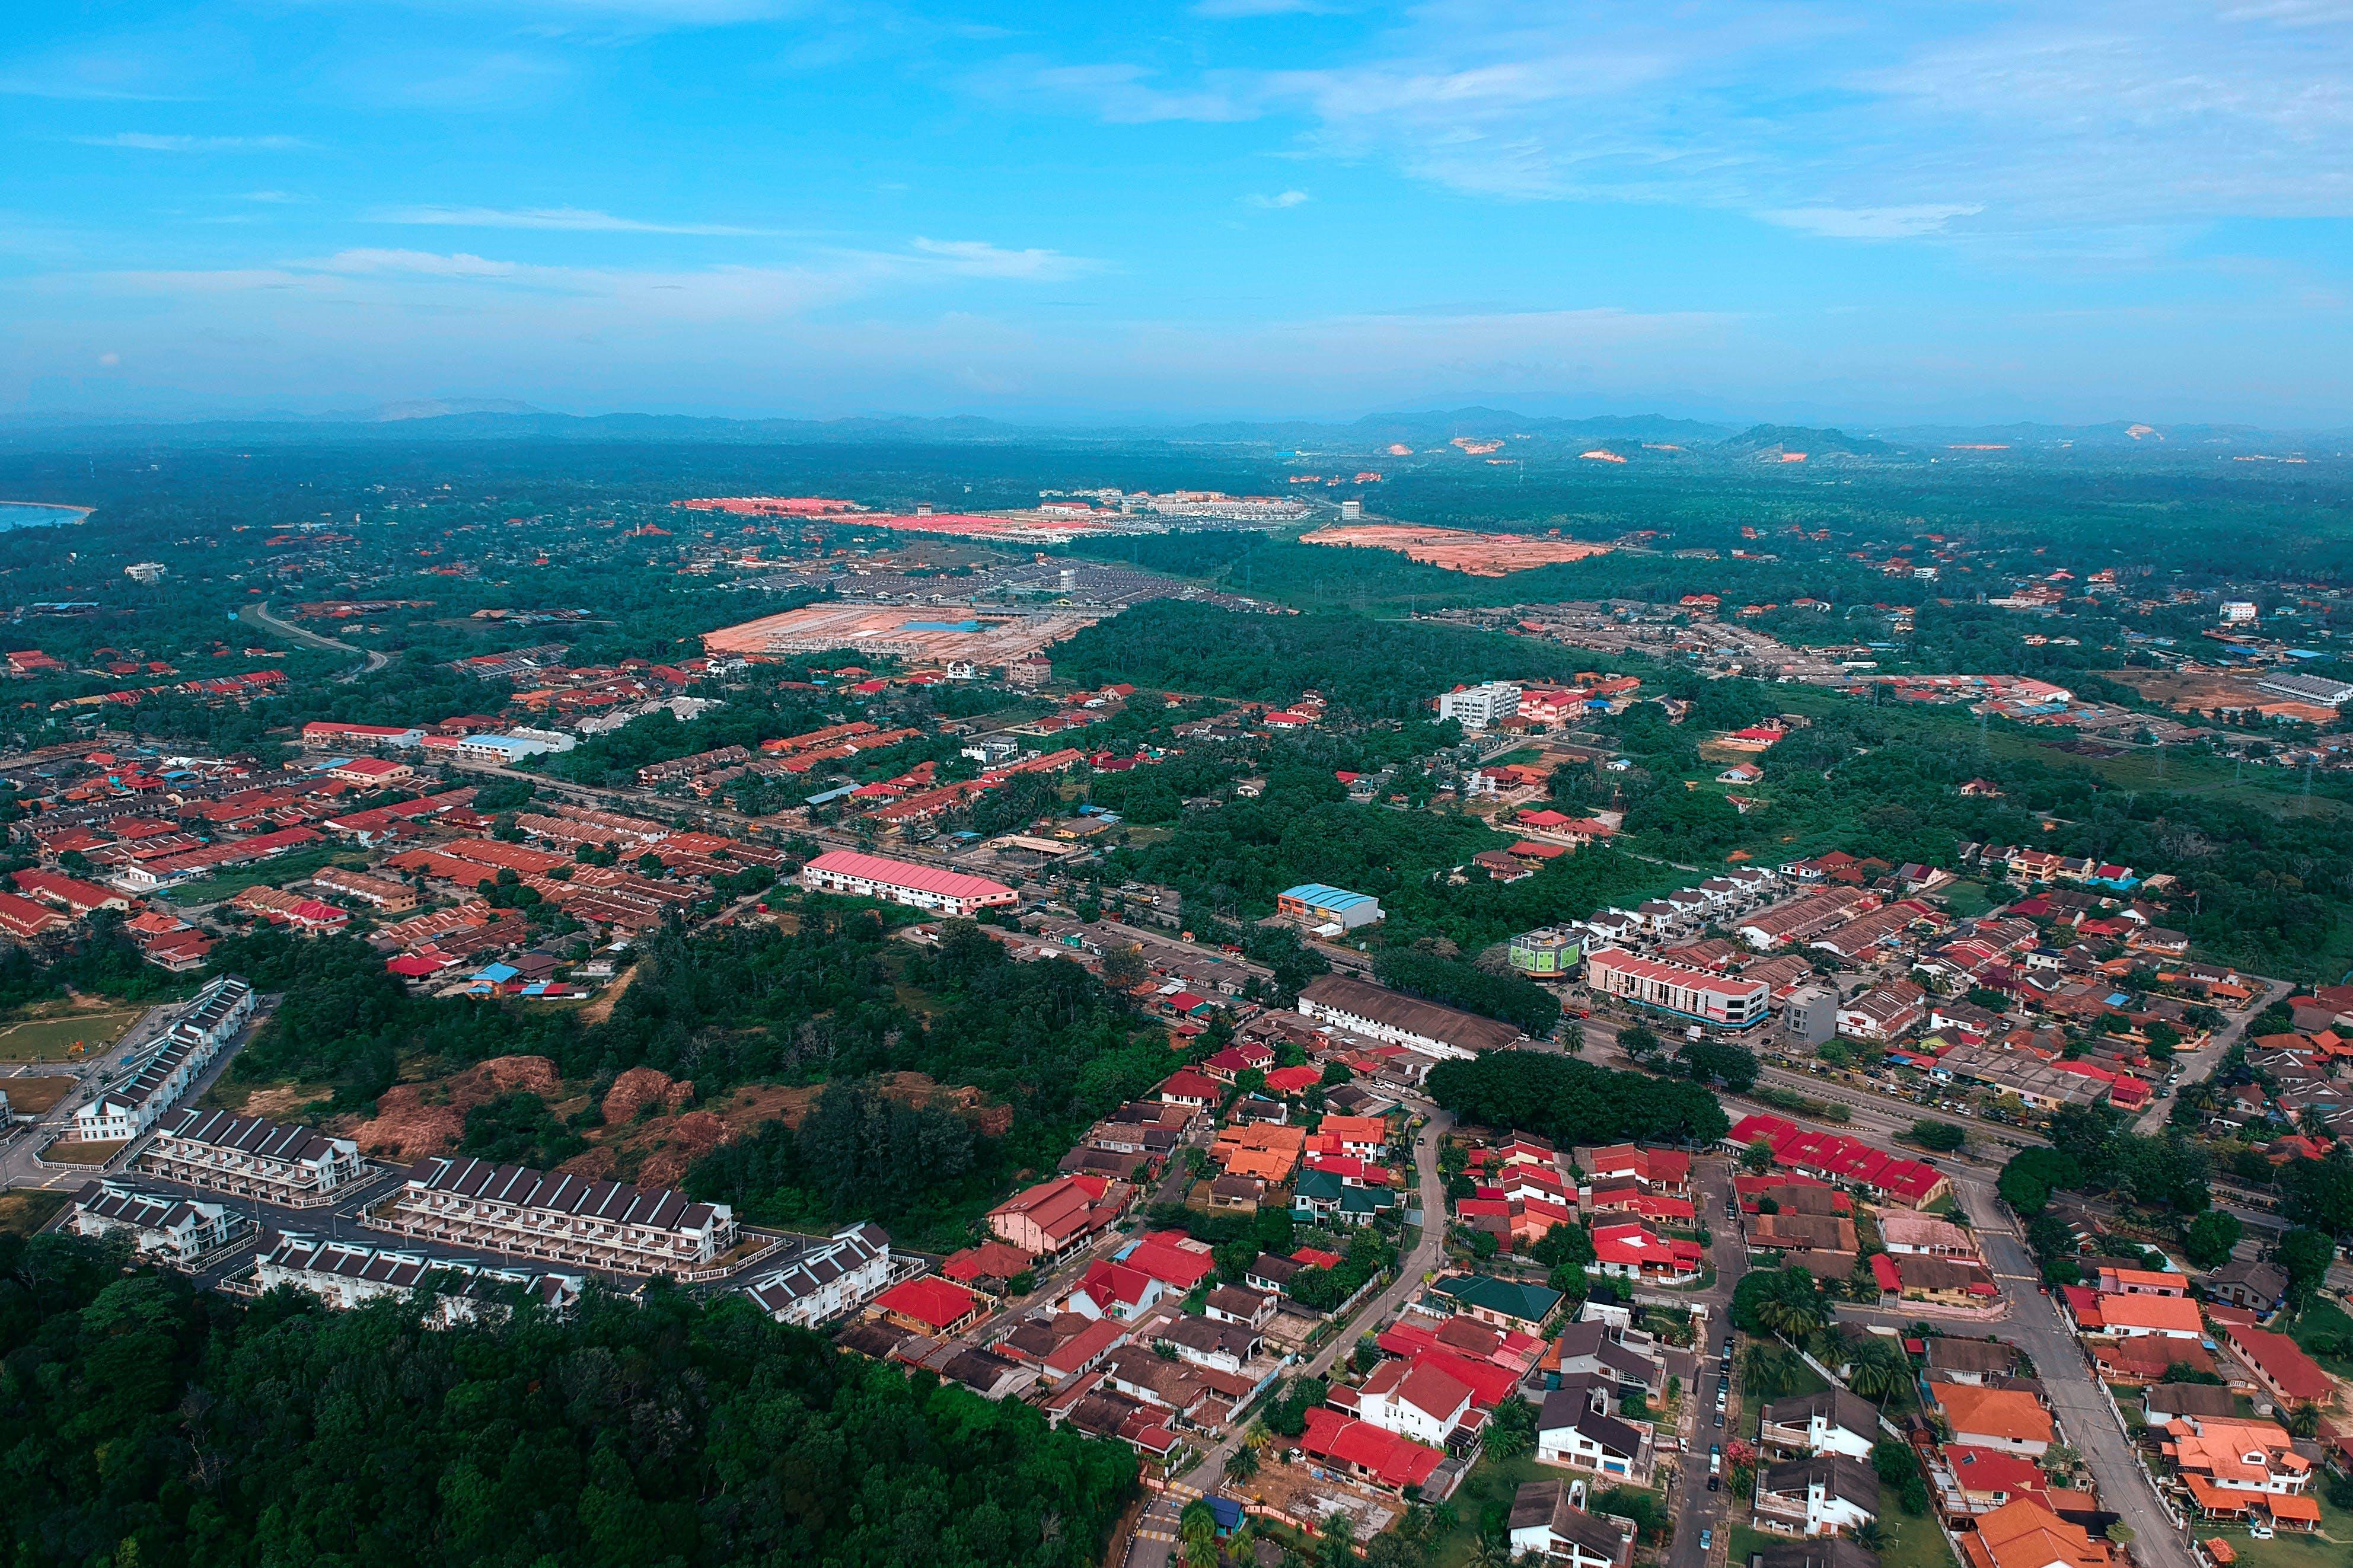 Bird's Eye View of Town